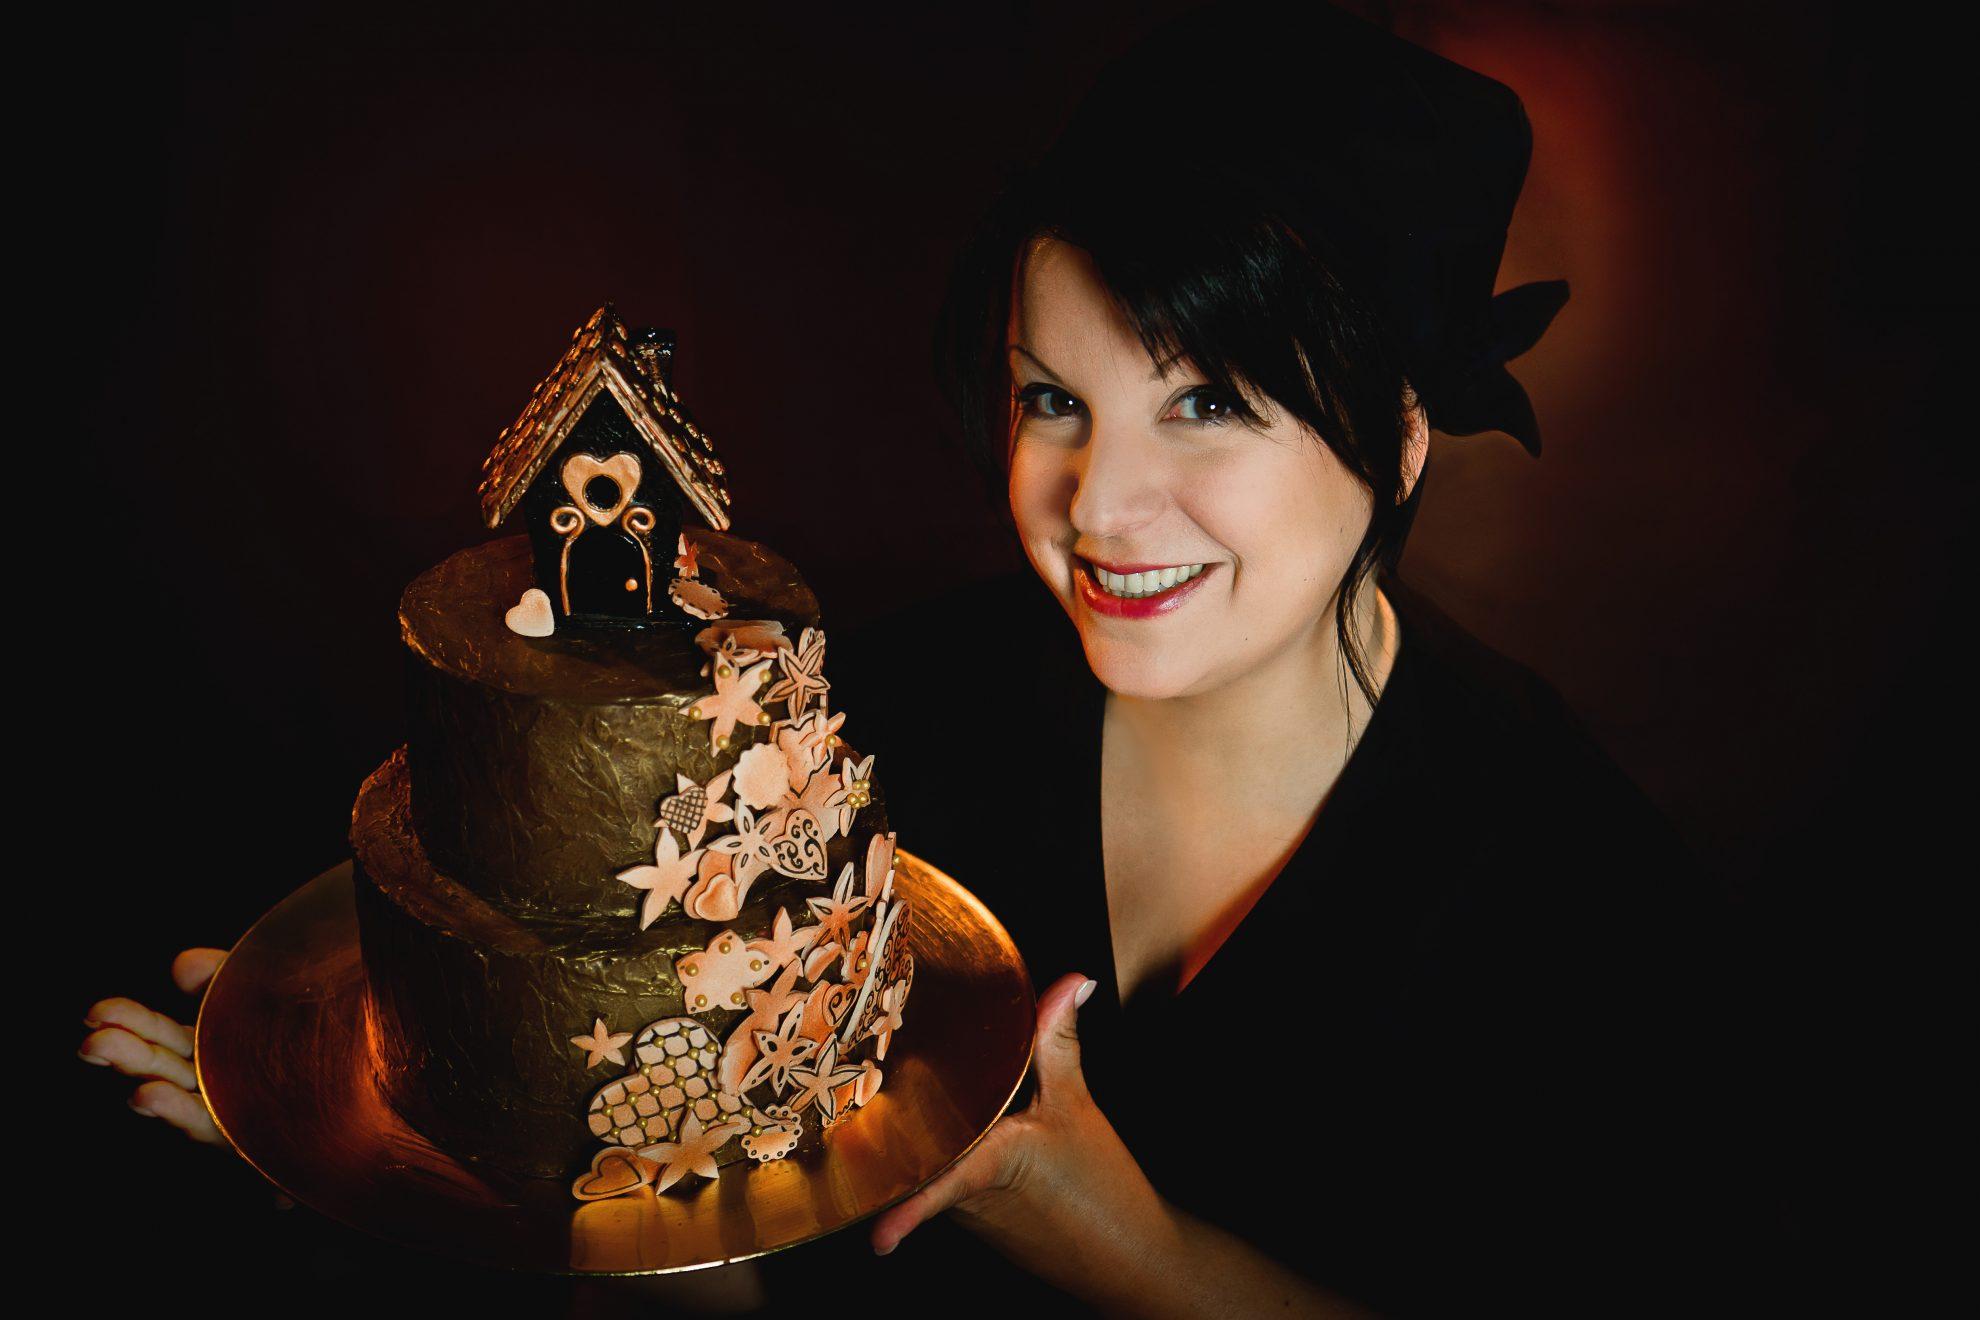 Marie B gâteau personnalisé à Strasbourg